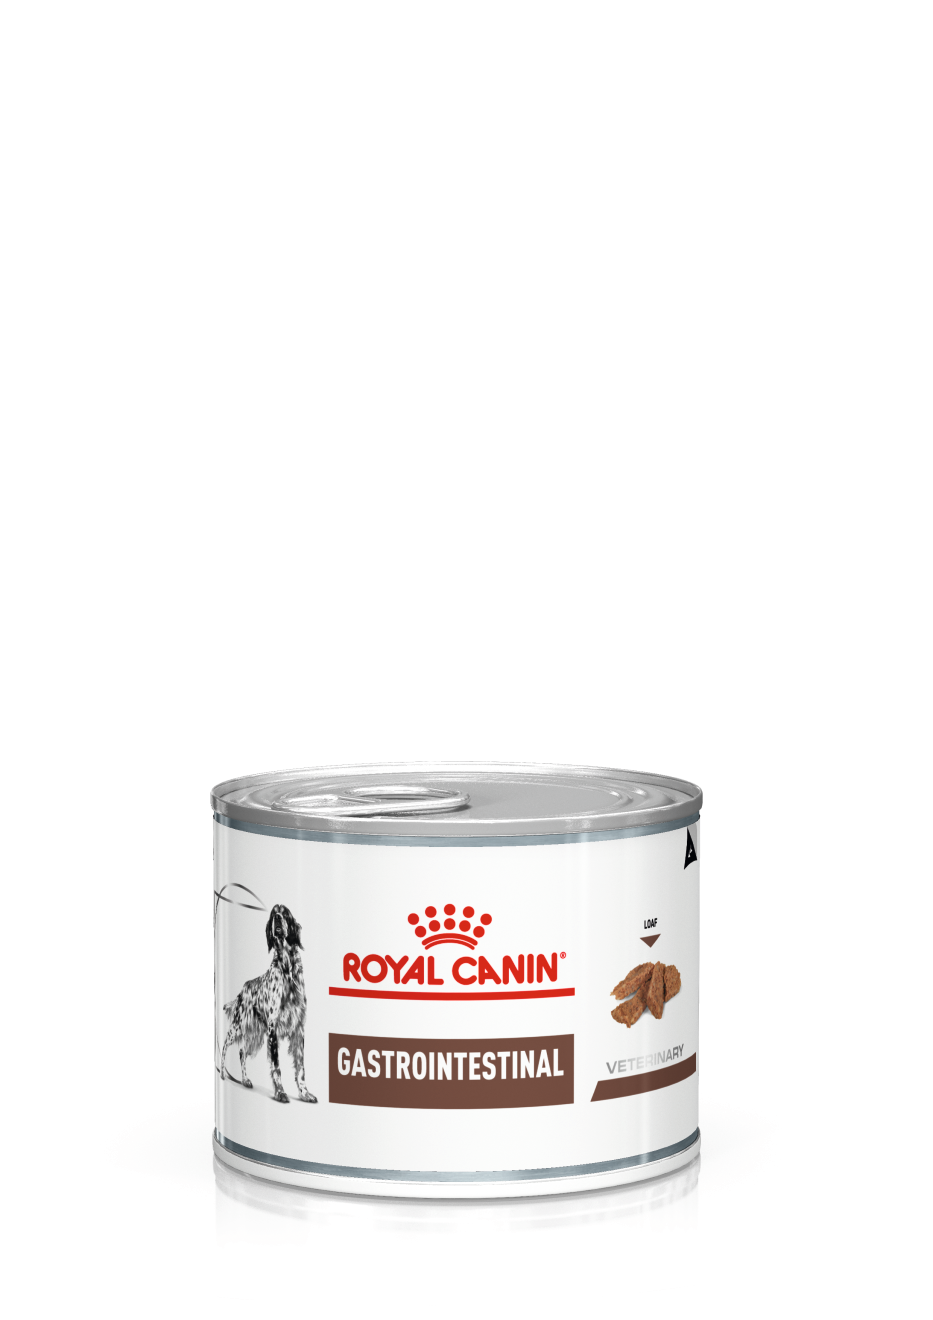 Royal Canin Gastrointestinal Mousse 1 Dose je 200g